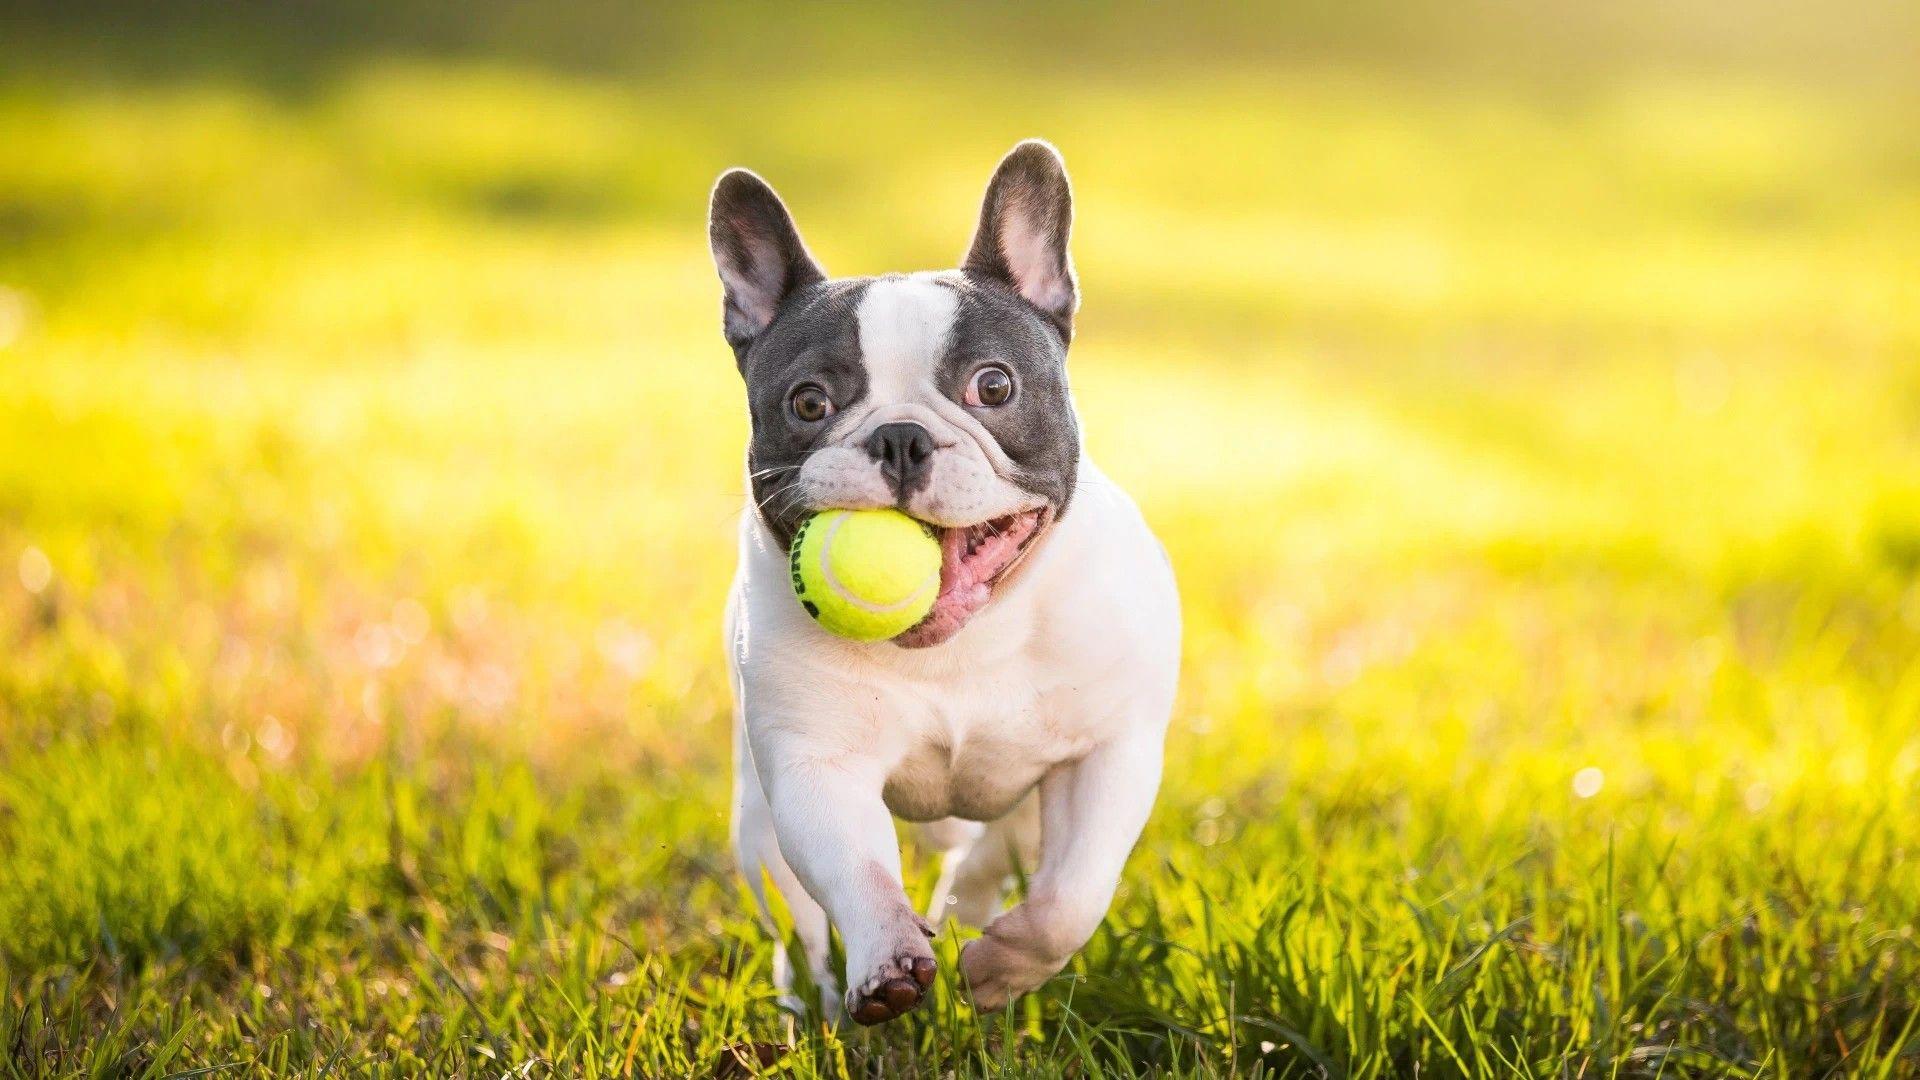 Dog French Bulldog Photo